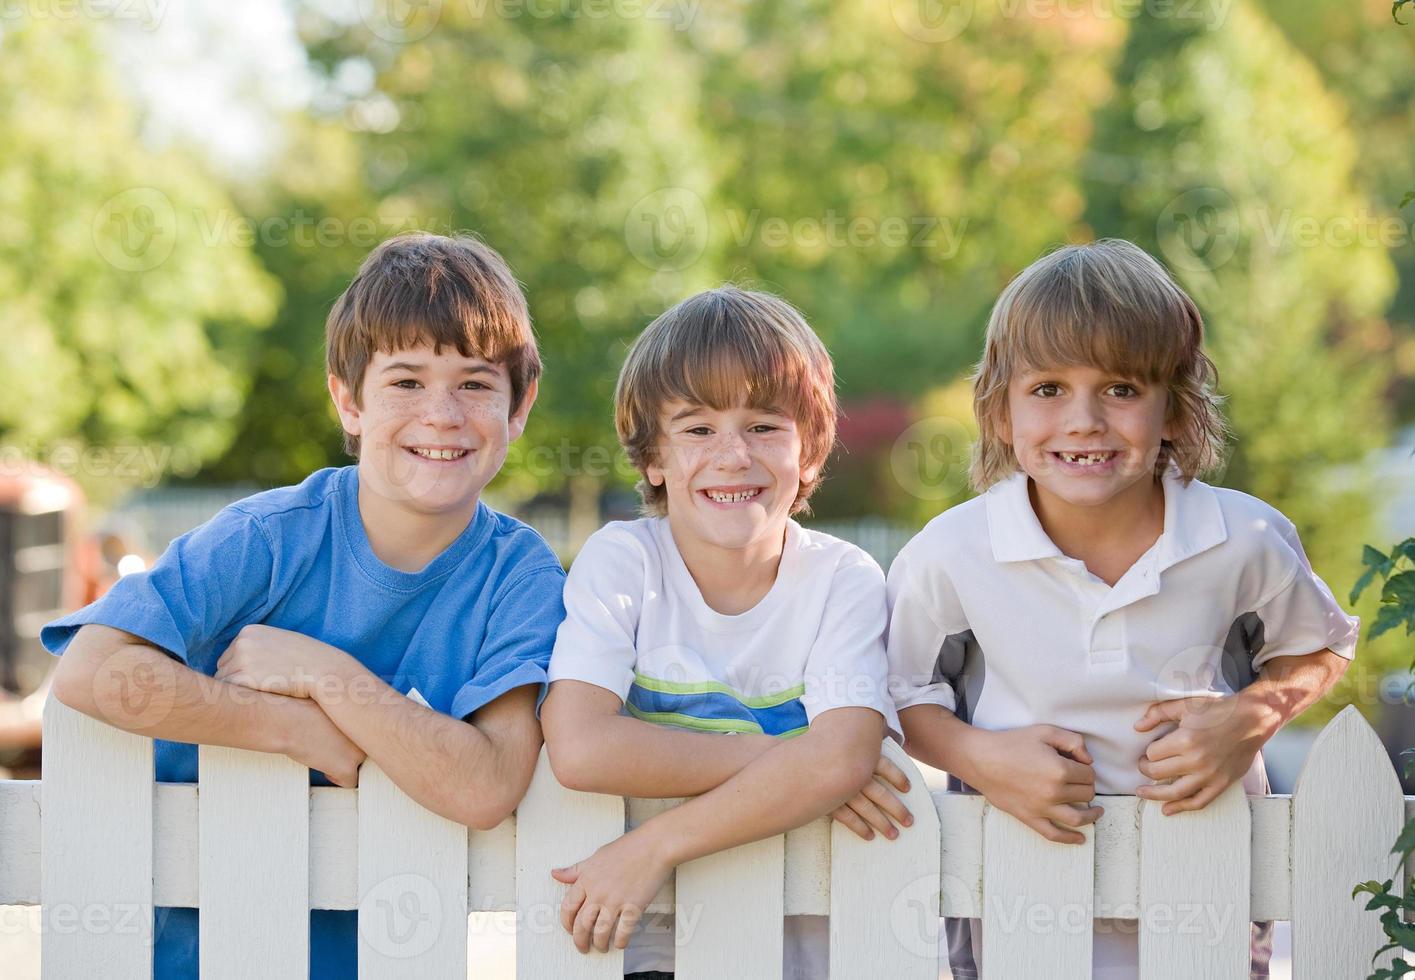 trois garçons photo